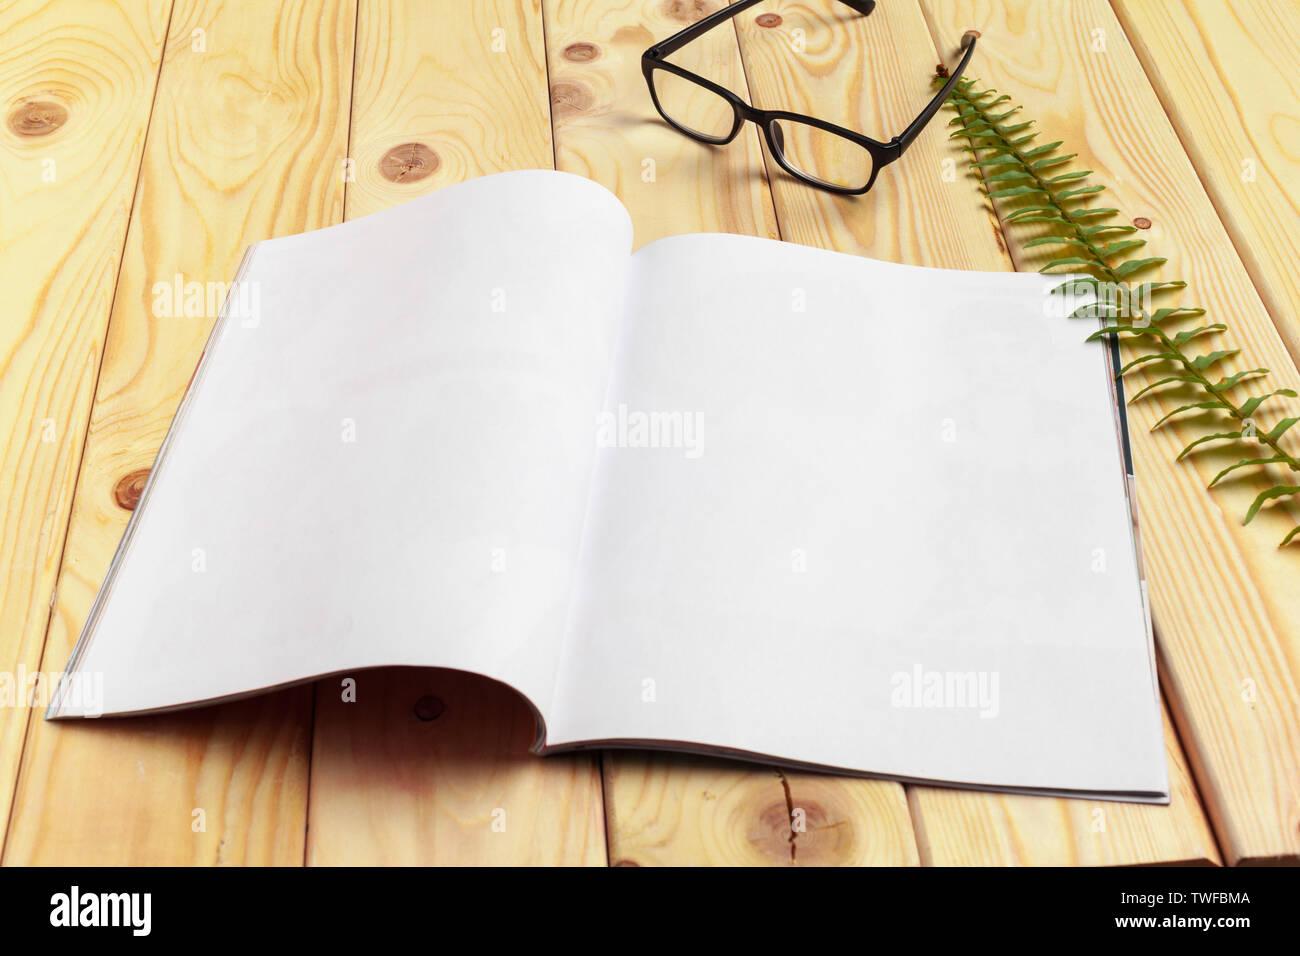 Mock-up magazine or catalog on wooden table. - Stock Image